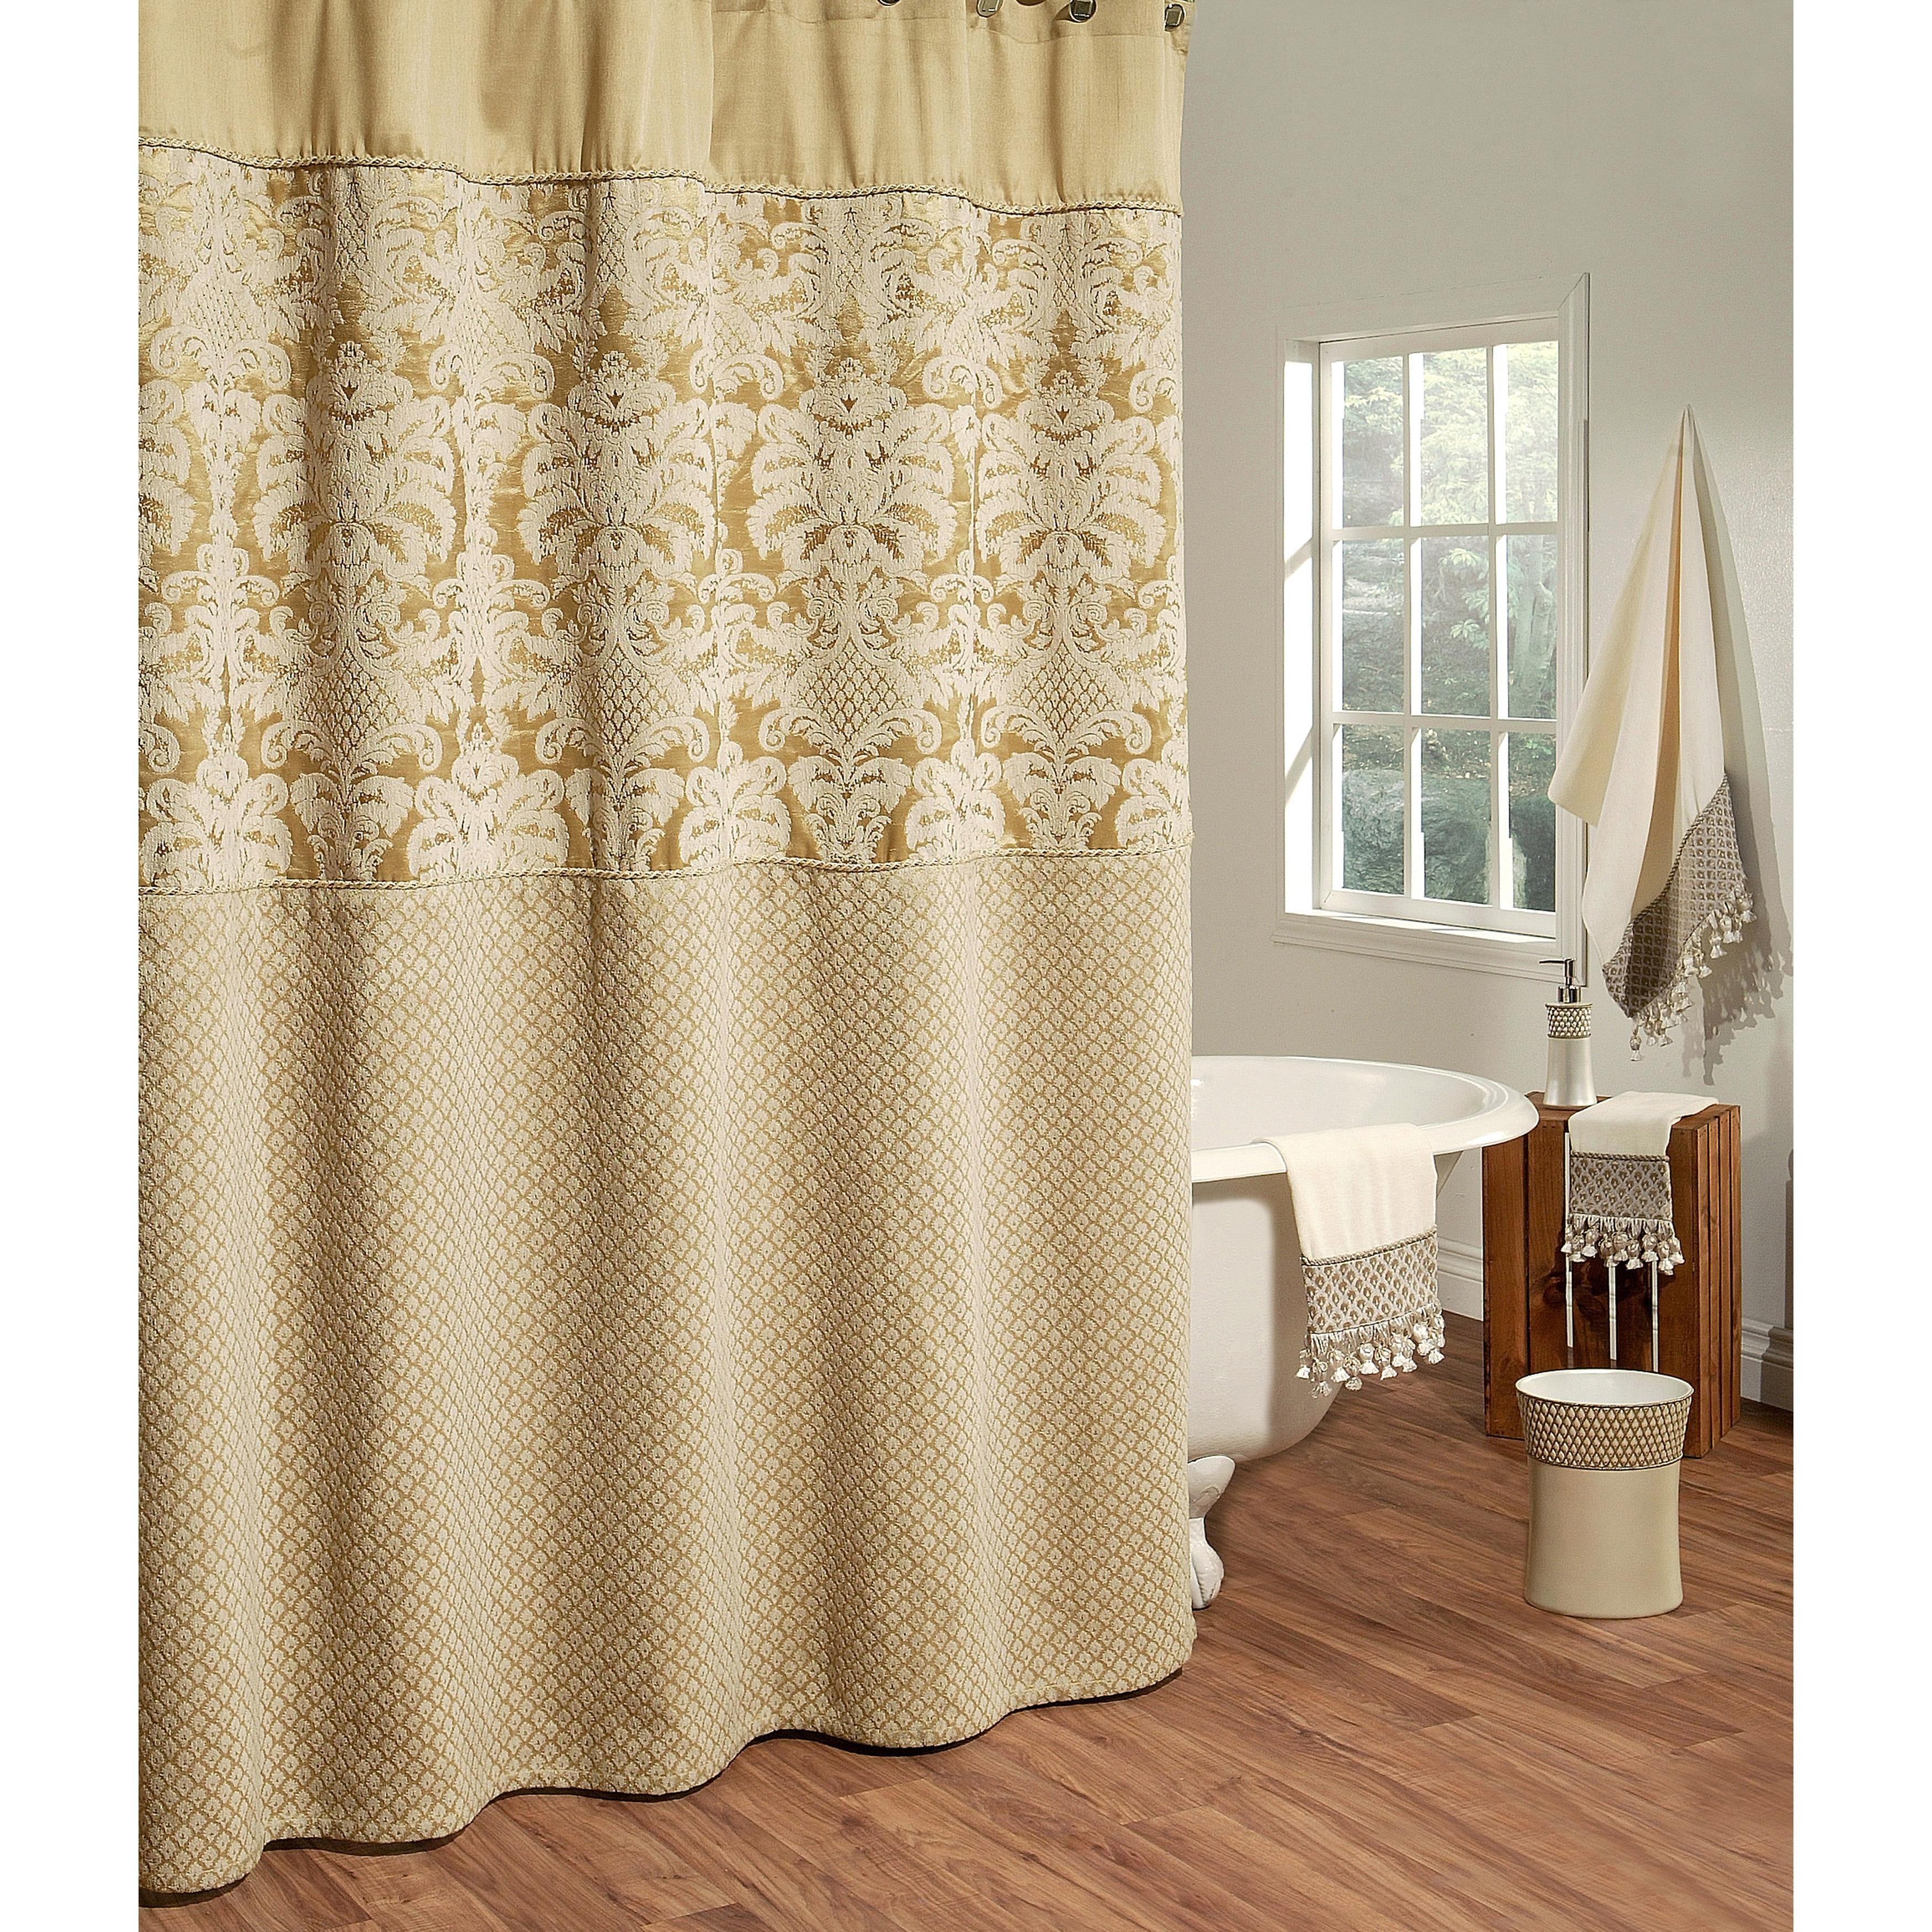 lovely veritas image at new brown walmart pict shower curtains elegant info of vox